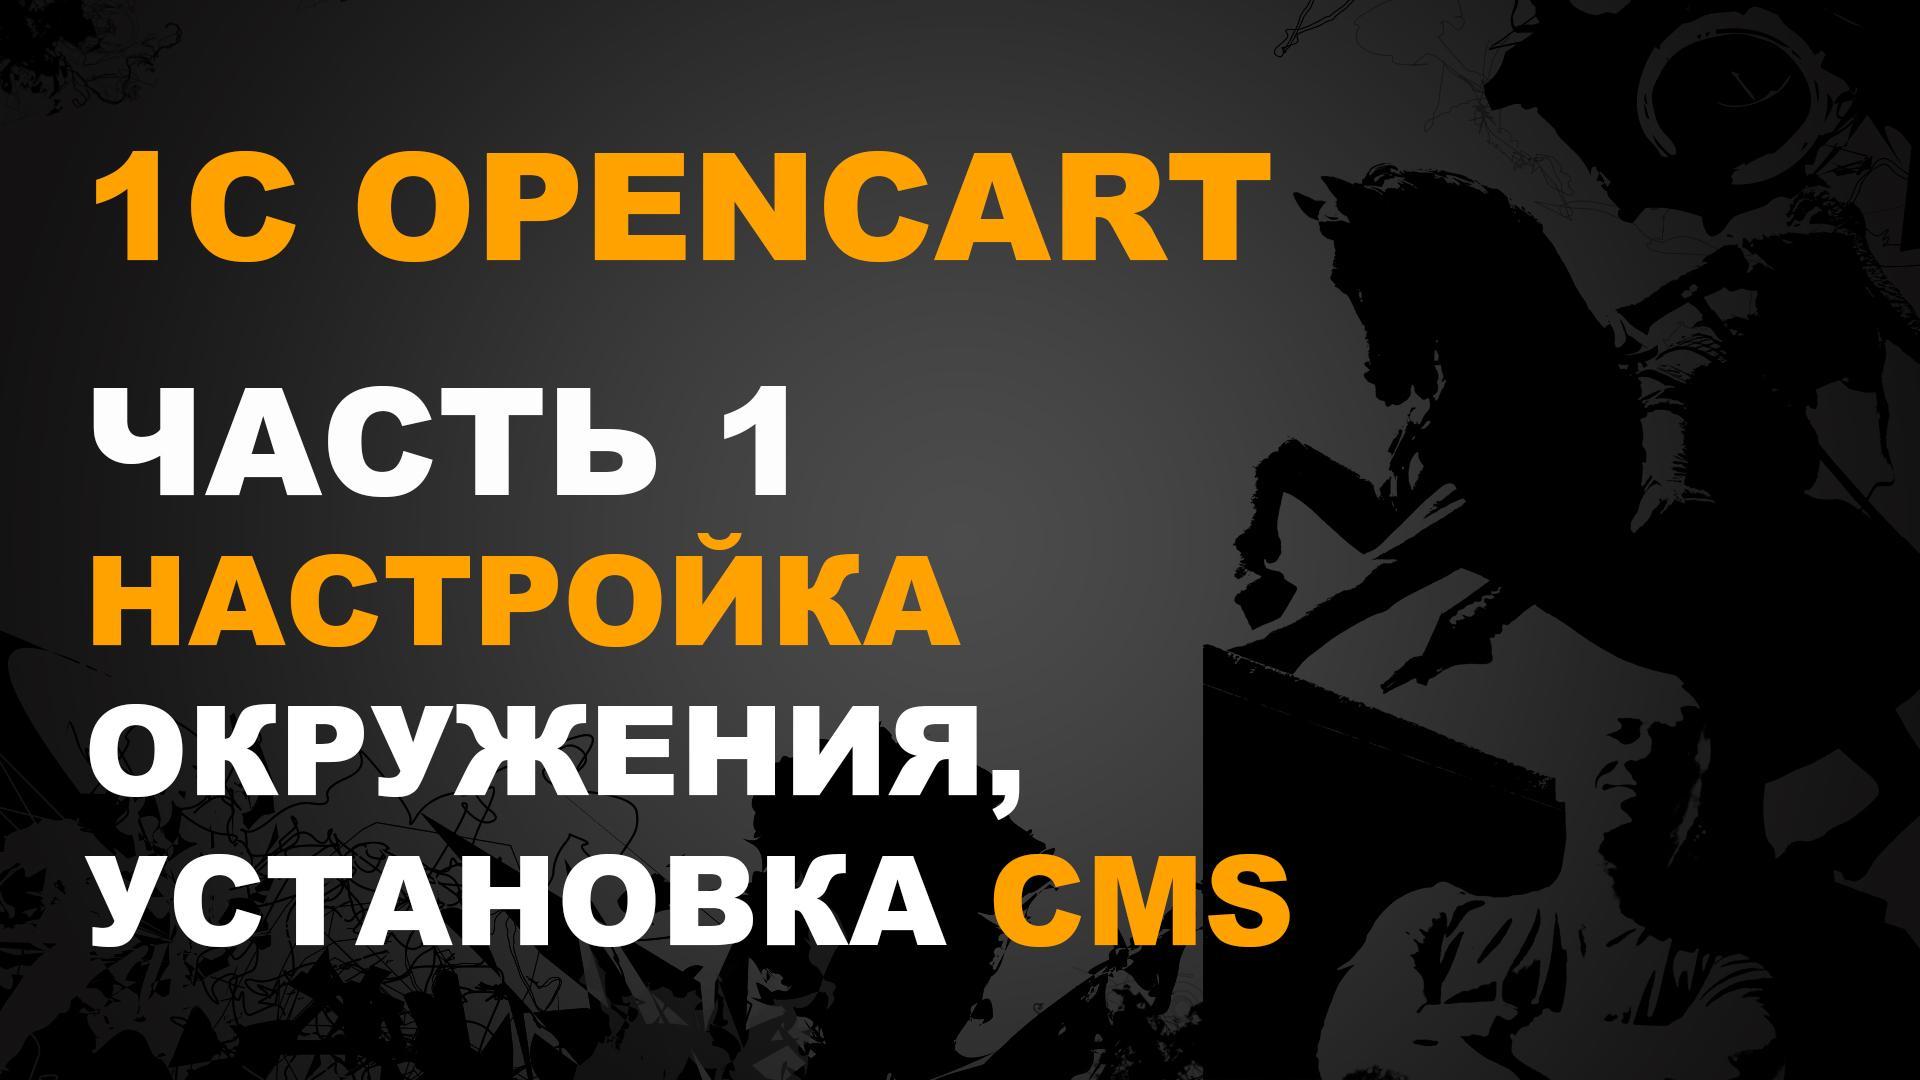 1с opencart